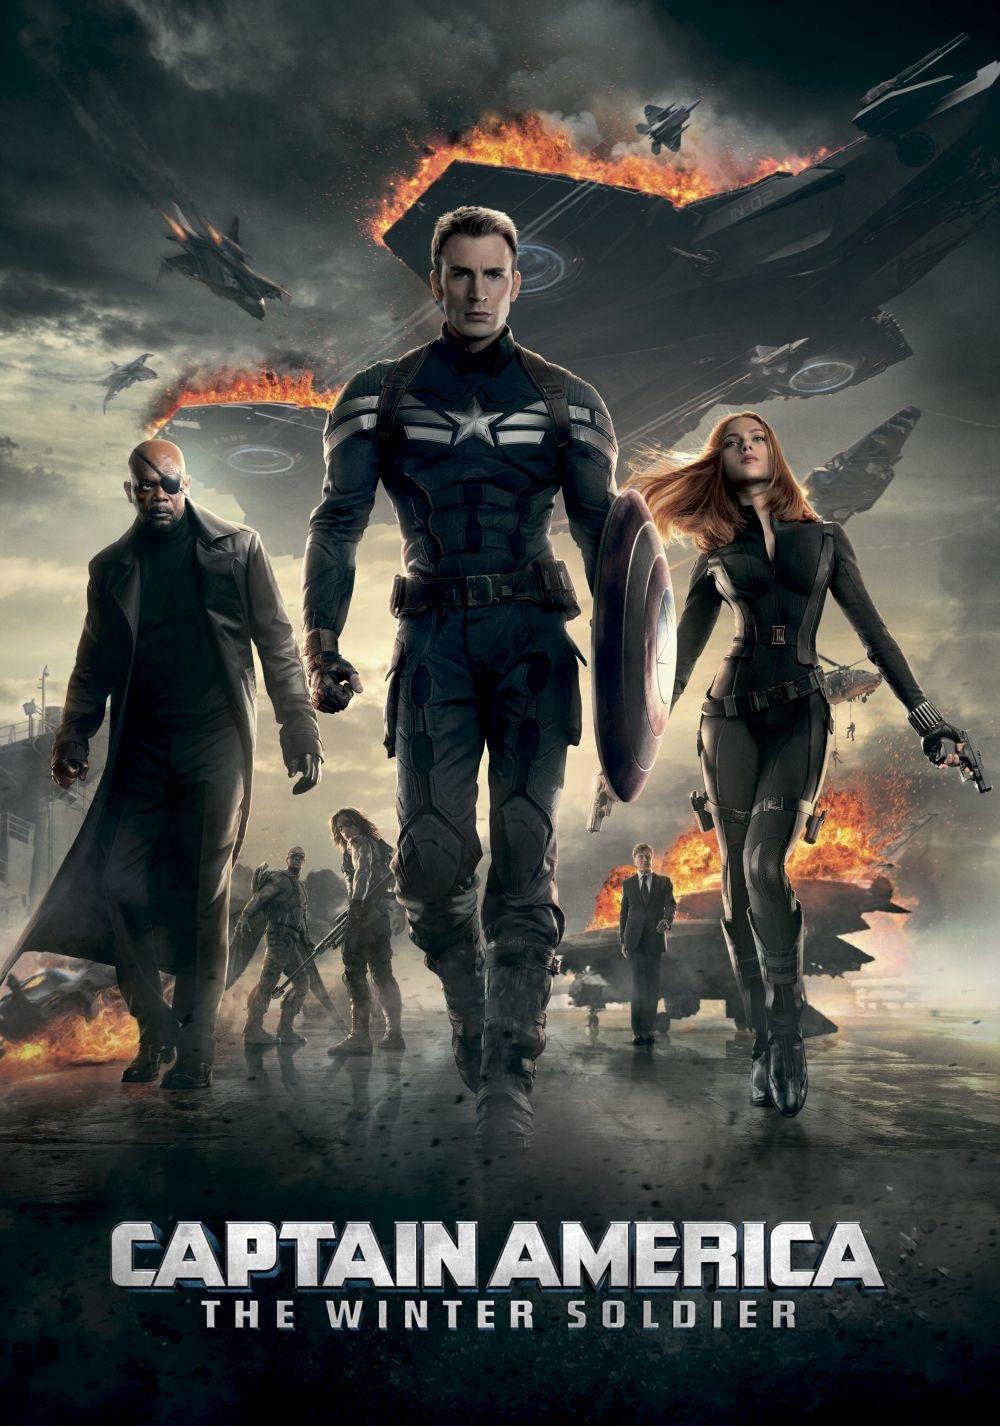 Captain America: The Winter Soldier Fanart